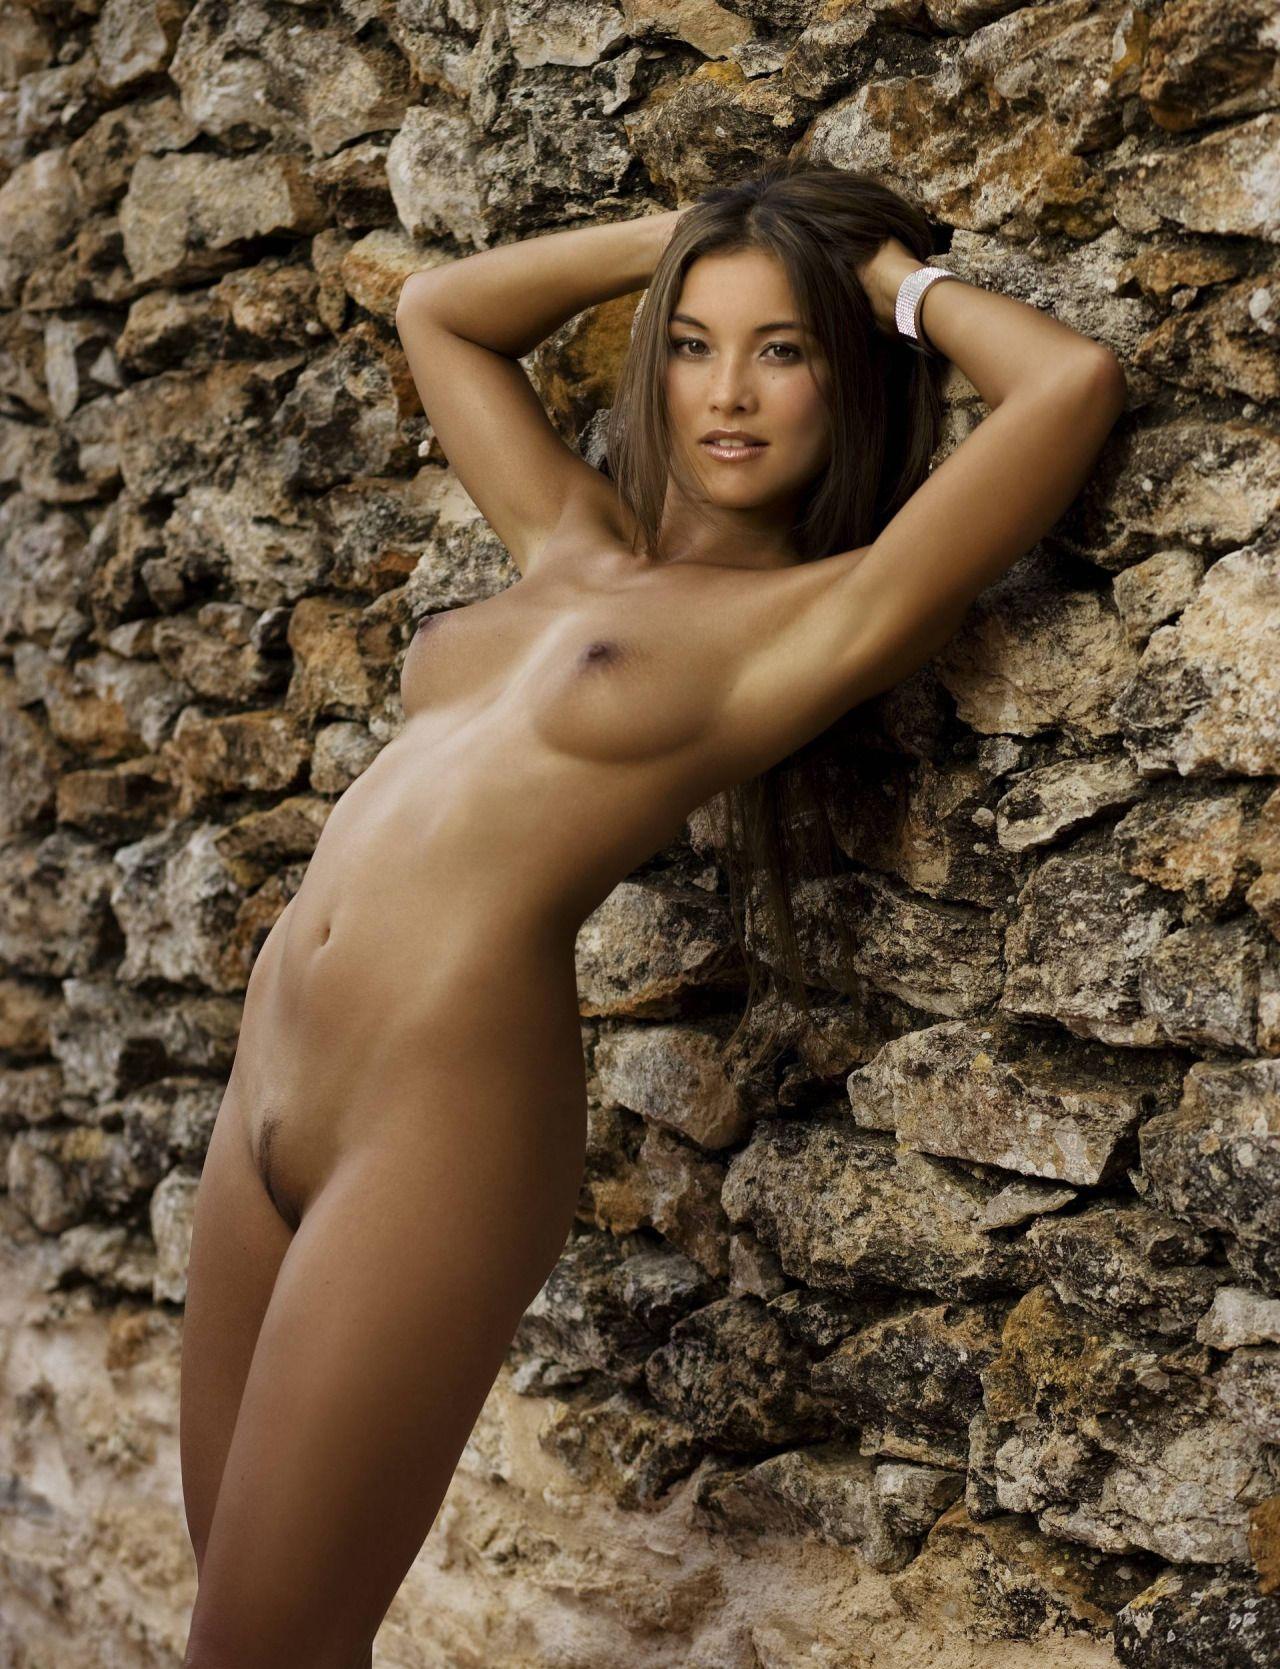 Corinne clery nude scenes